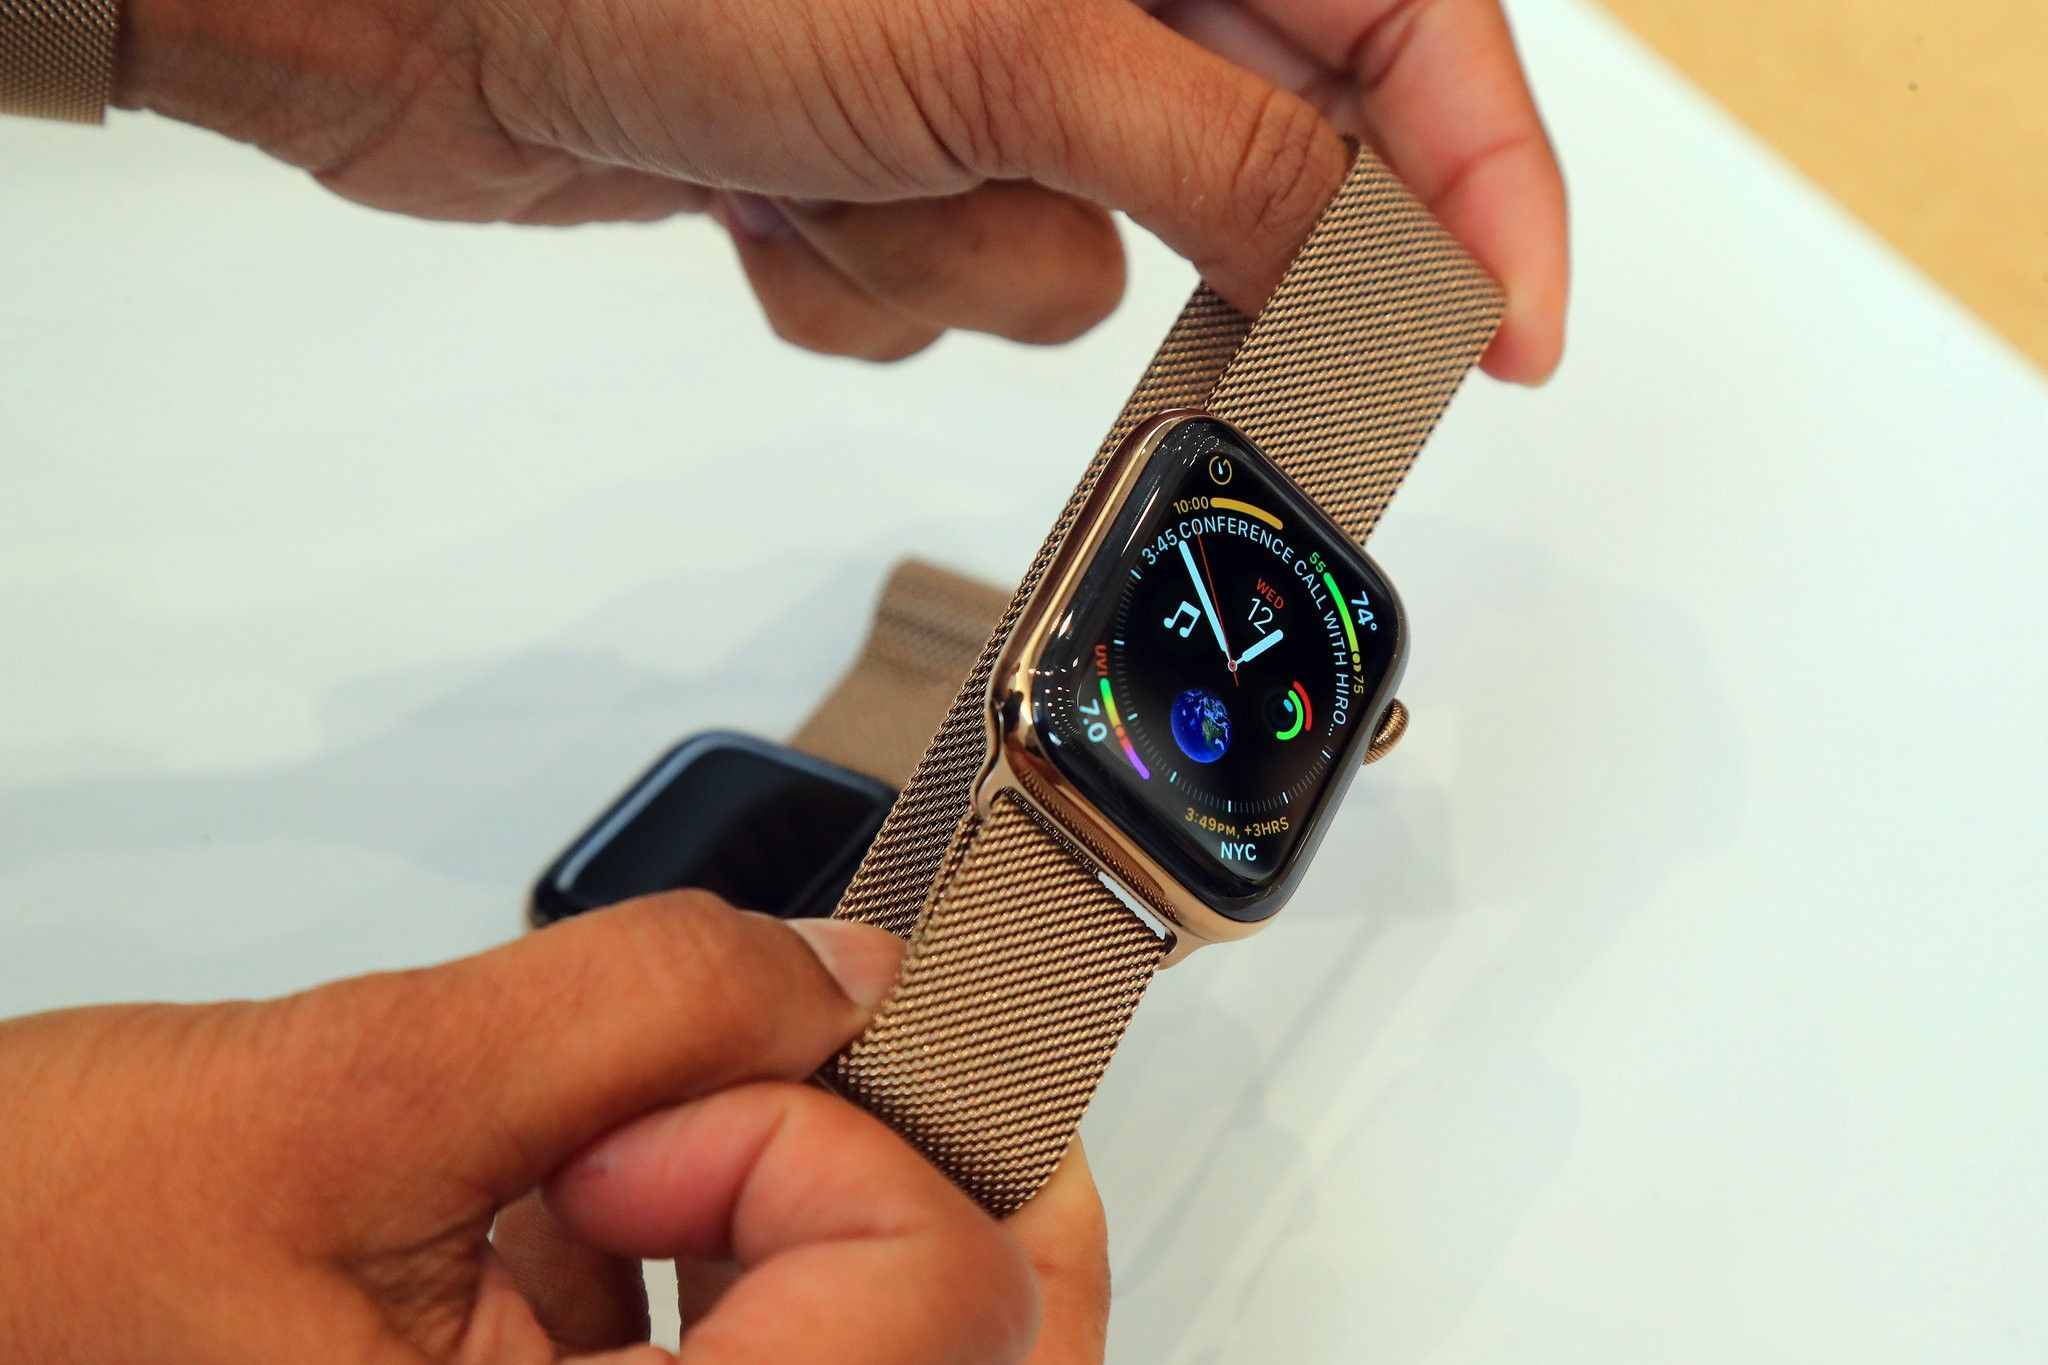 smart health watch app